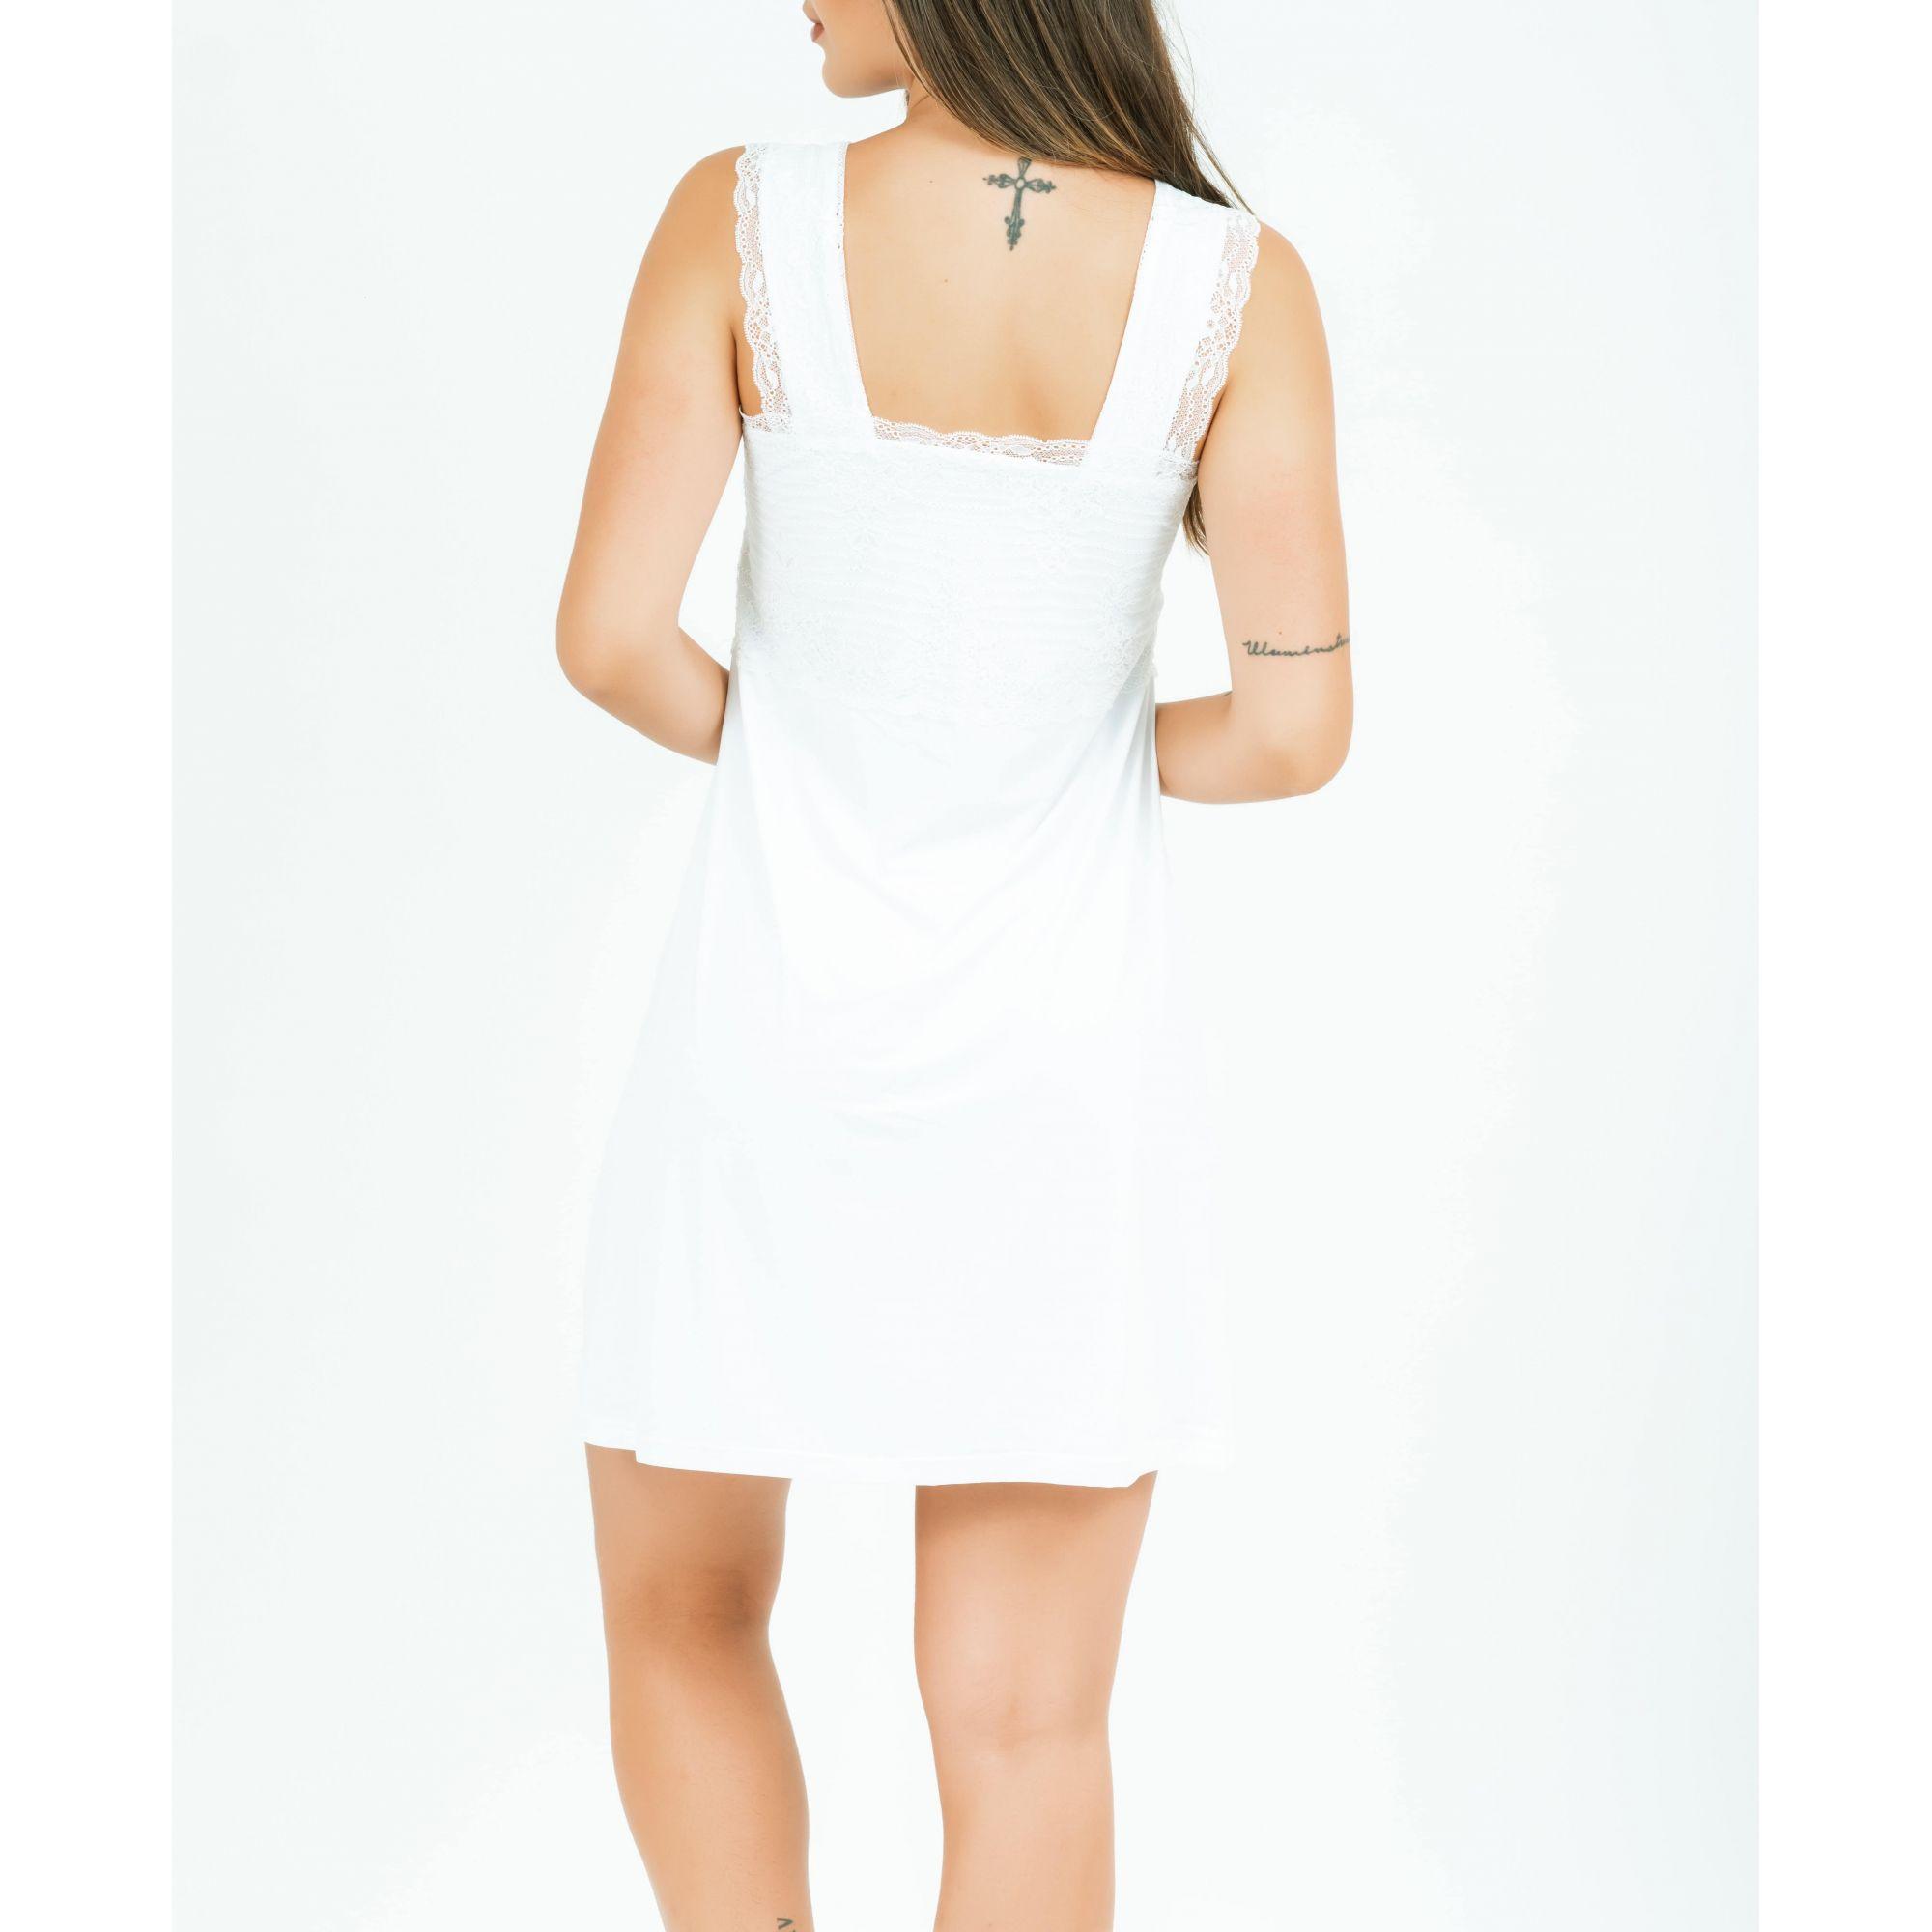 Camisola Natália Curta - Branco   - Lalie Lalou